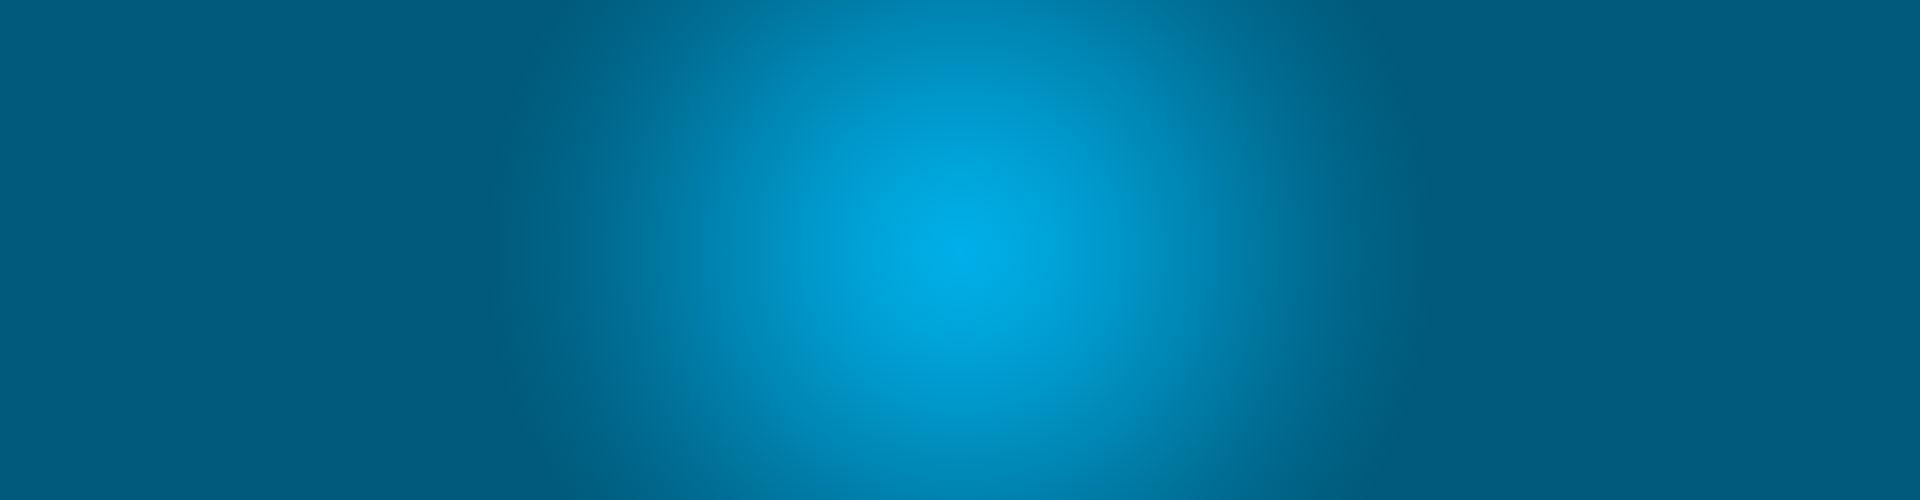 blue-background_slider1